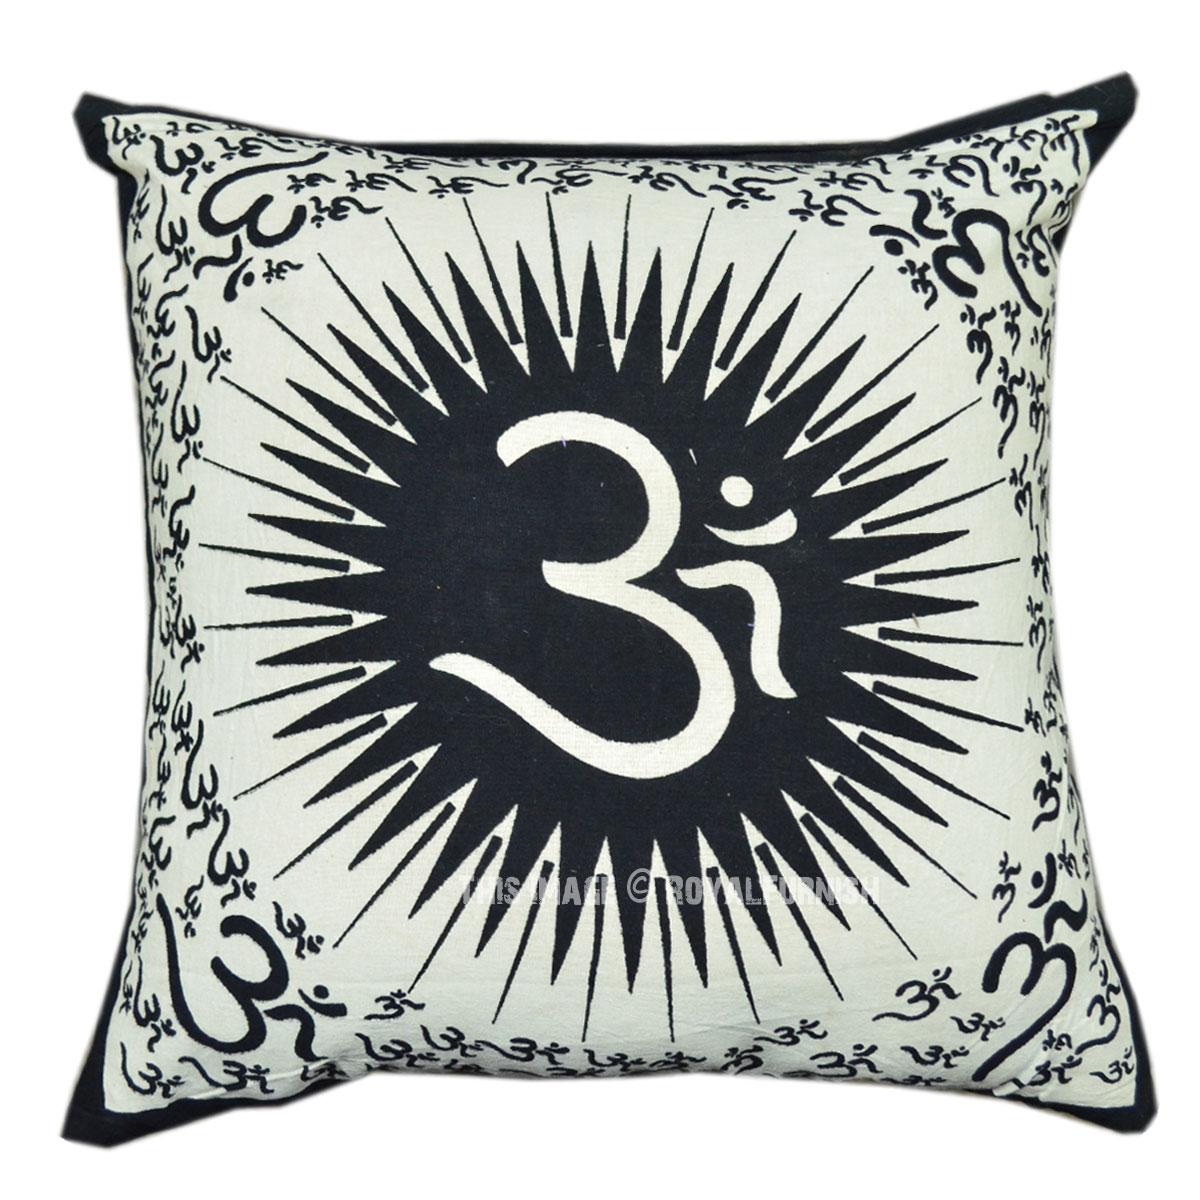 Black And White Decorative Throw Pillows : Black and White OM Aum Printed Decorative & Accent Throw Pillow Cover - RoyalFurnish.com